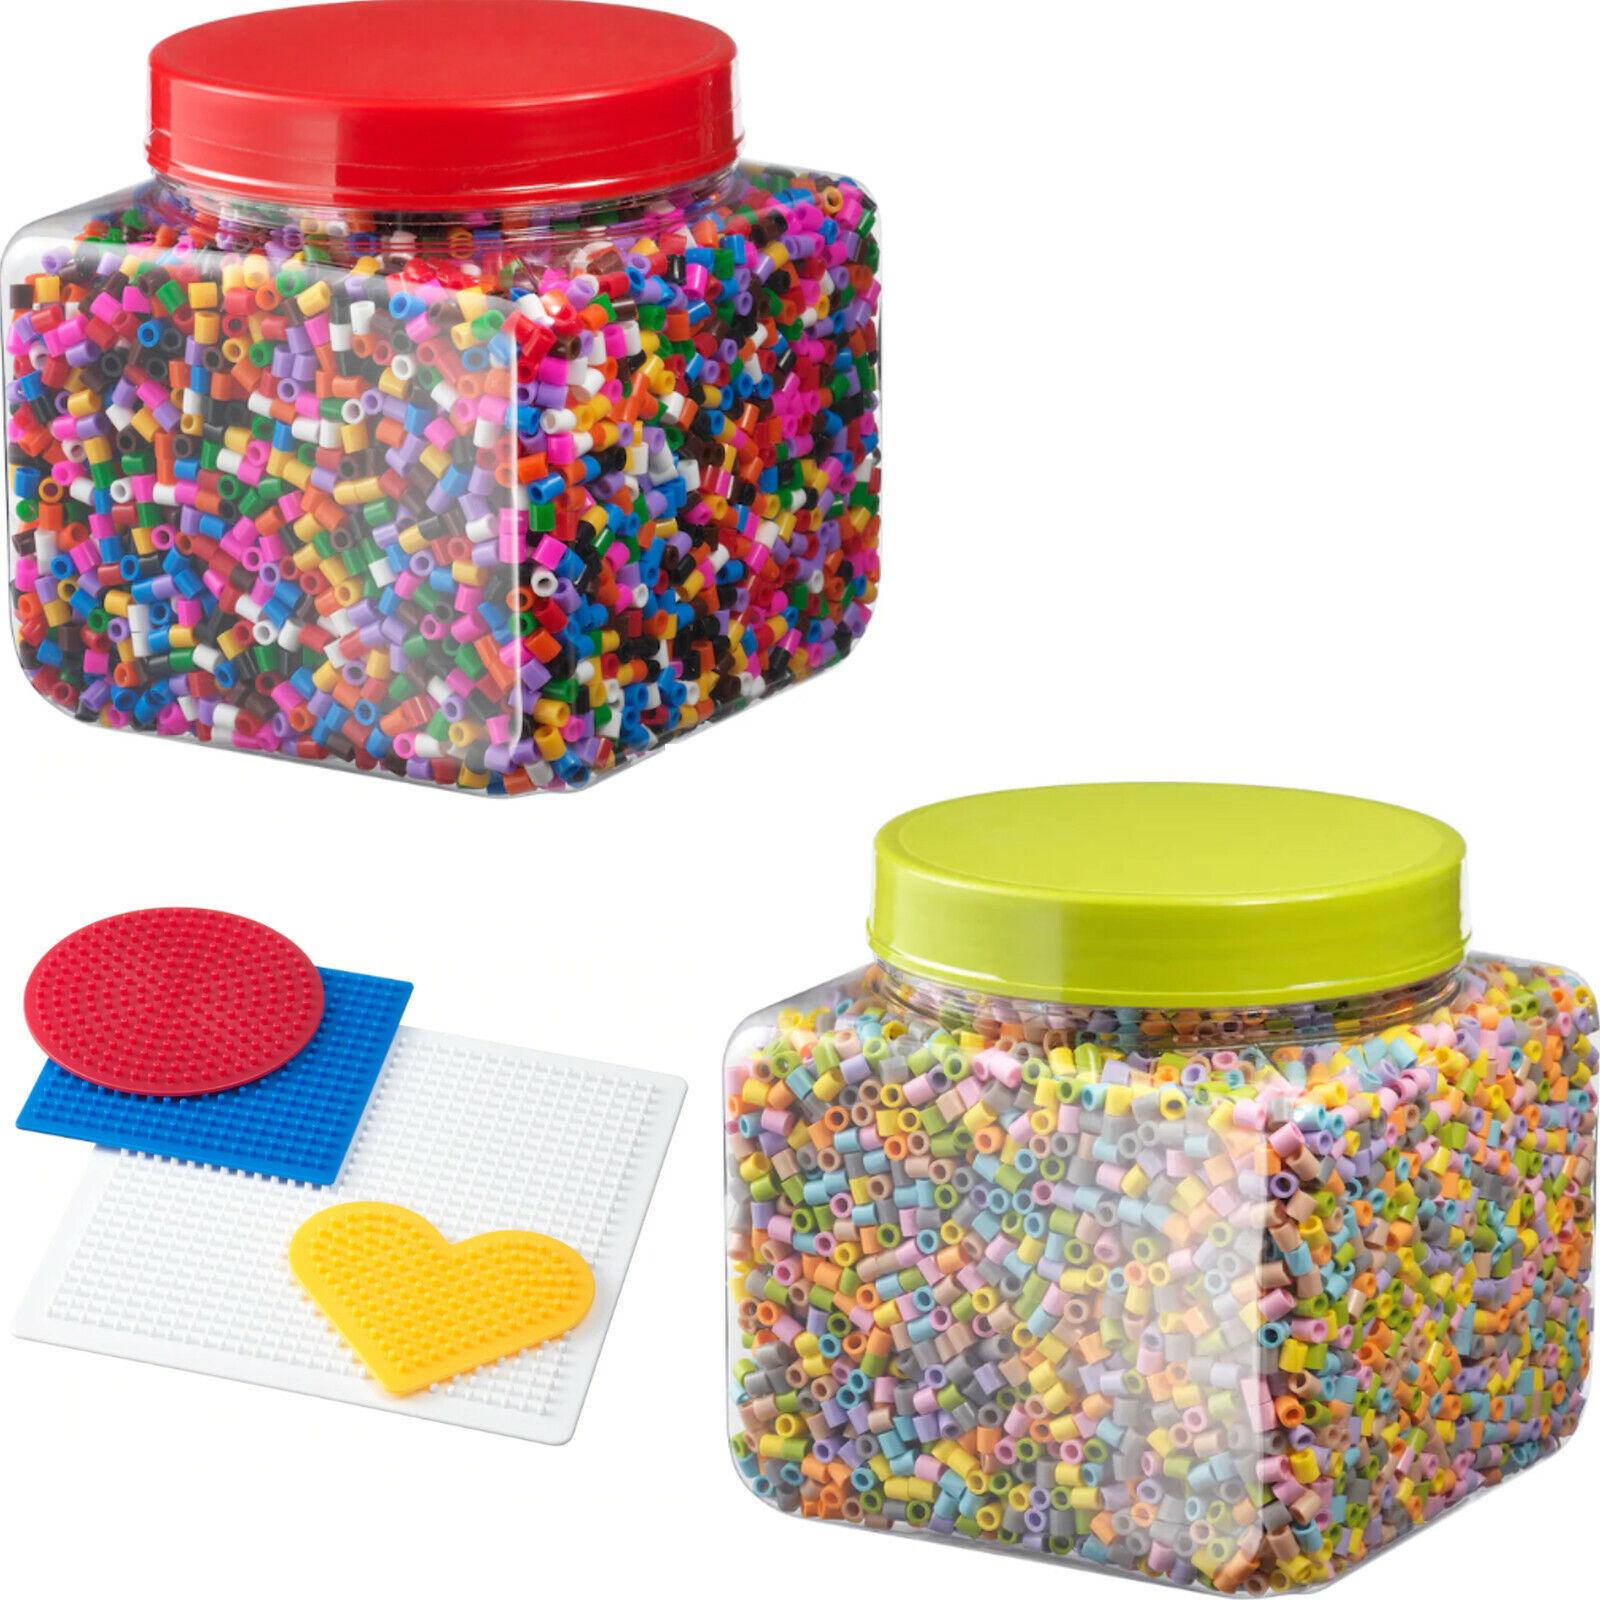 Hama 211 54 Bugelperlen Dose Mit Ca 13 000 Perlen Transparent